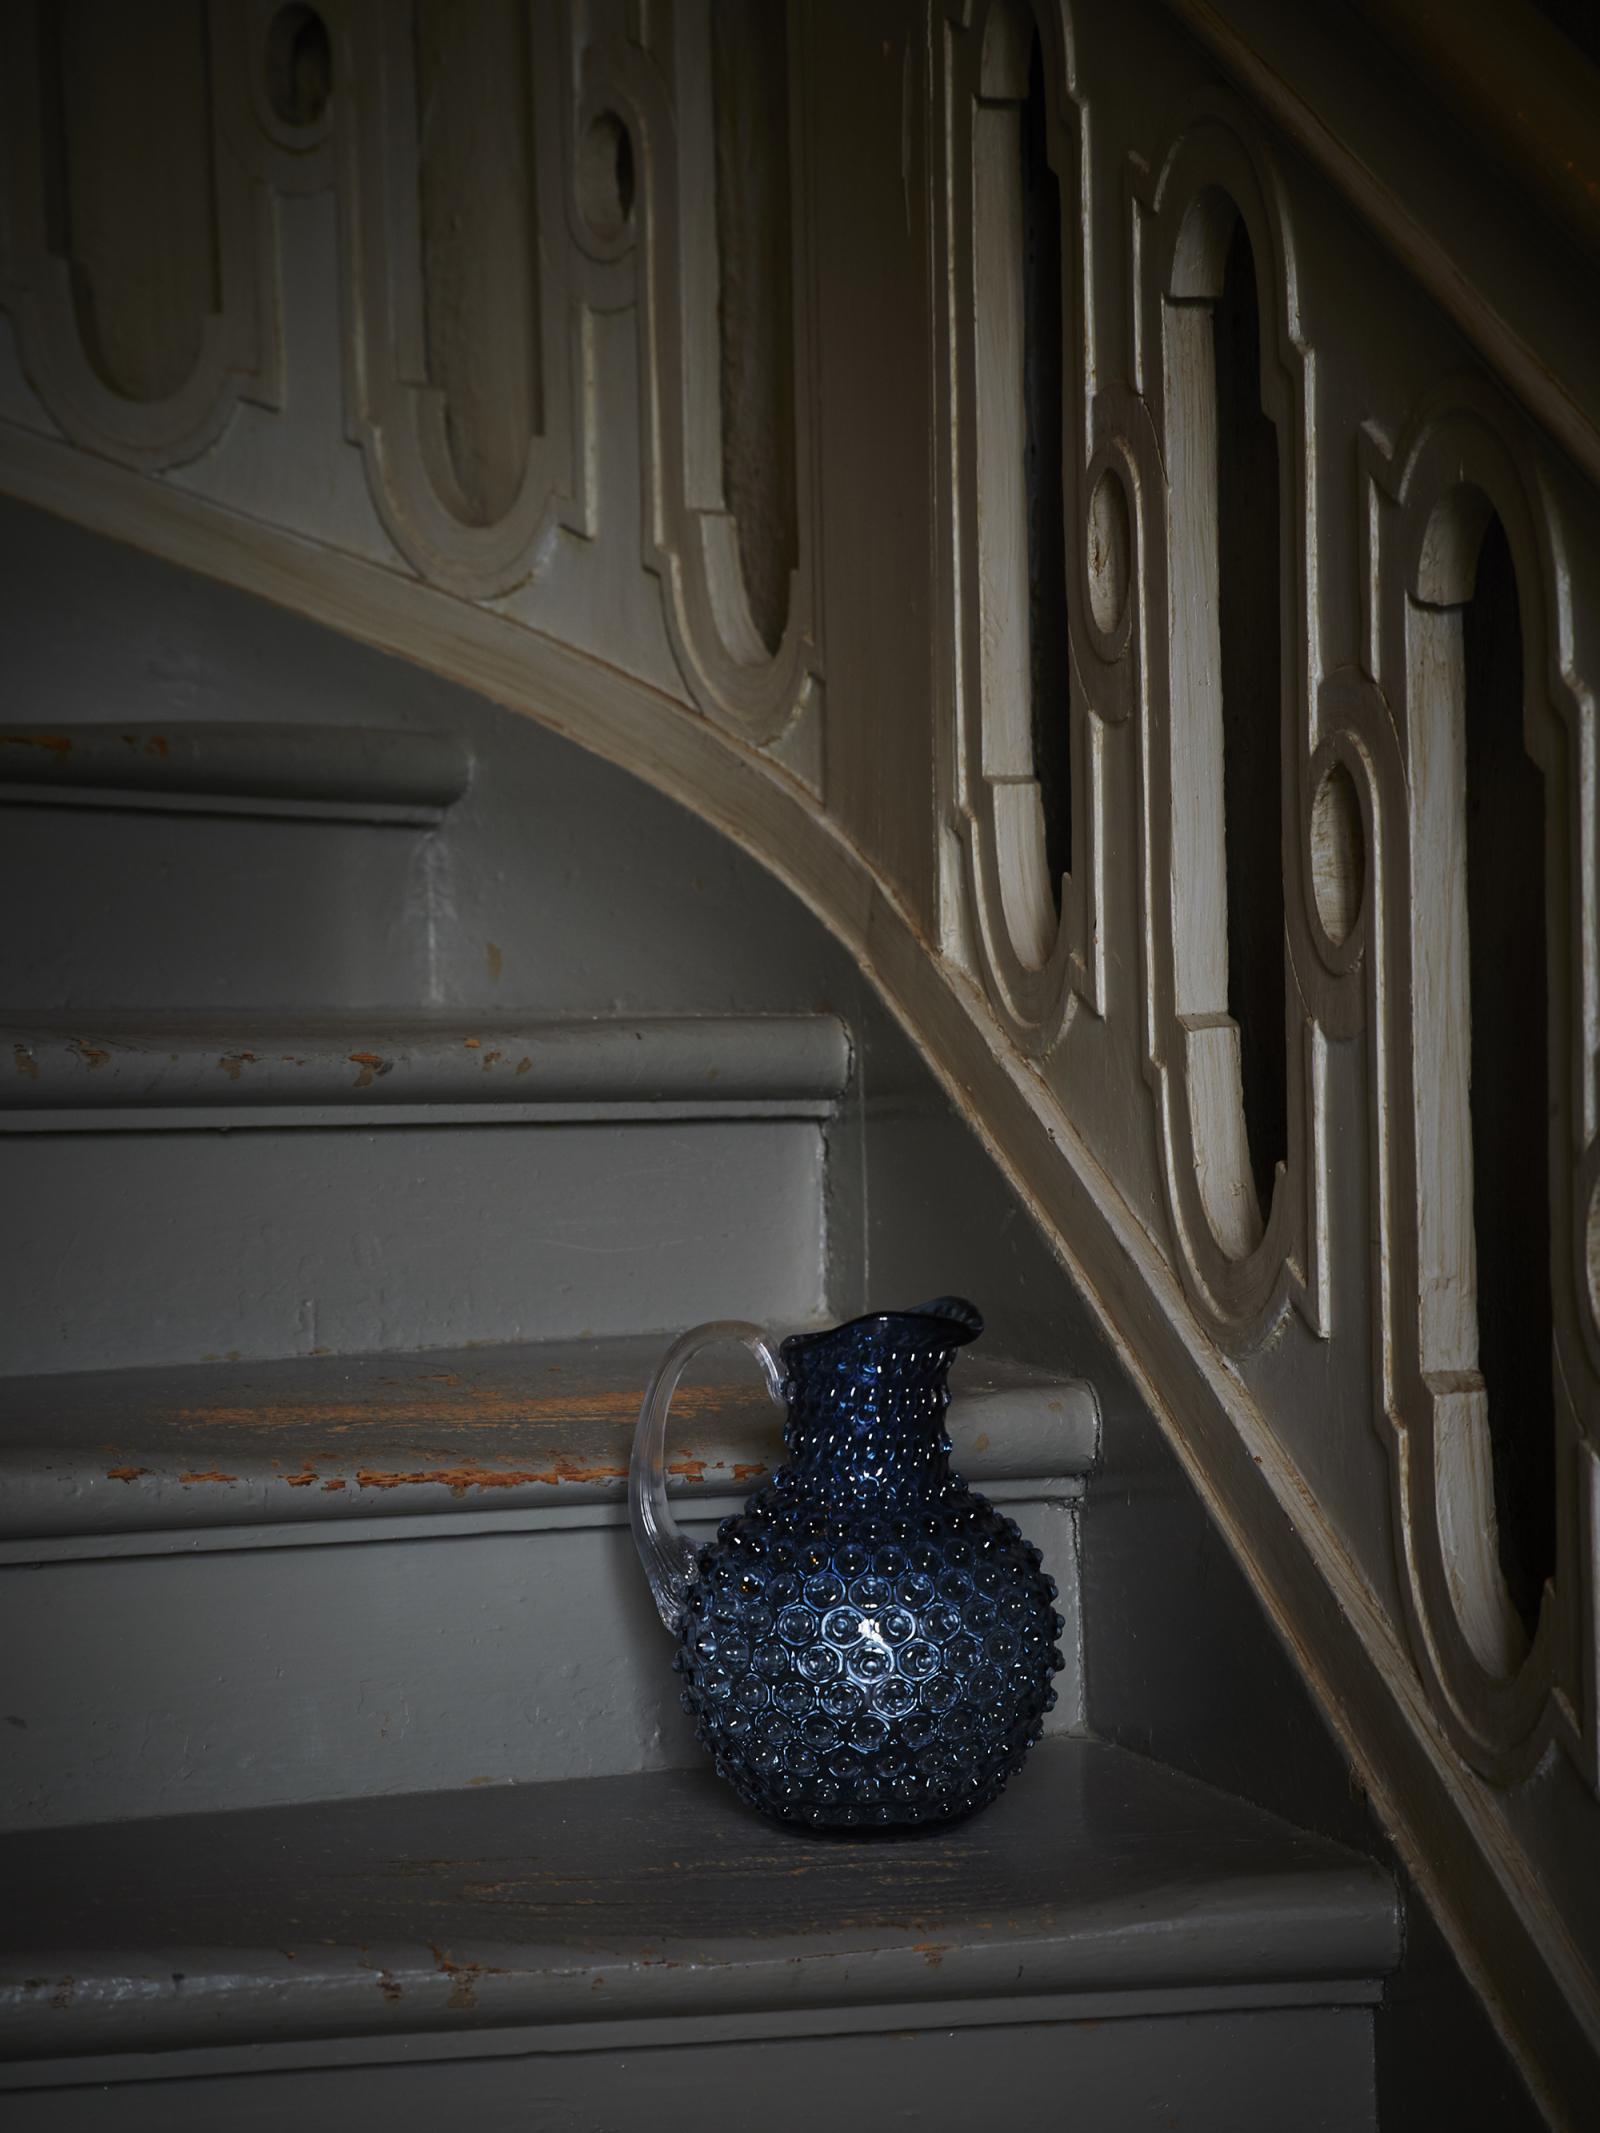 Linné Carafe Ocean Blue 899 SEK